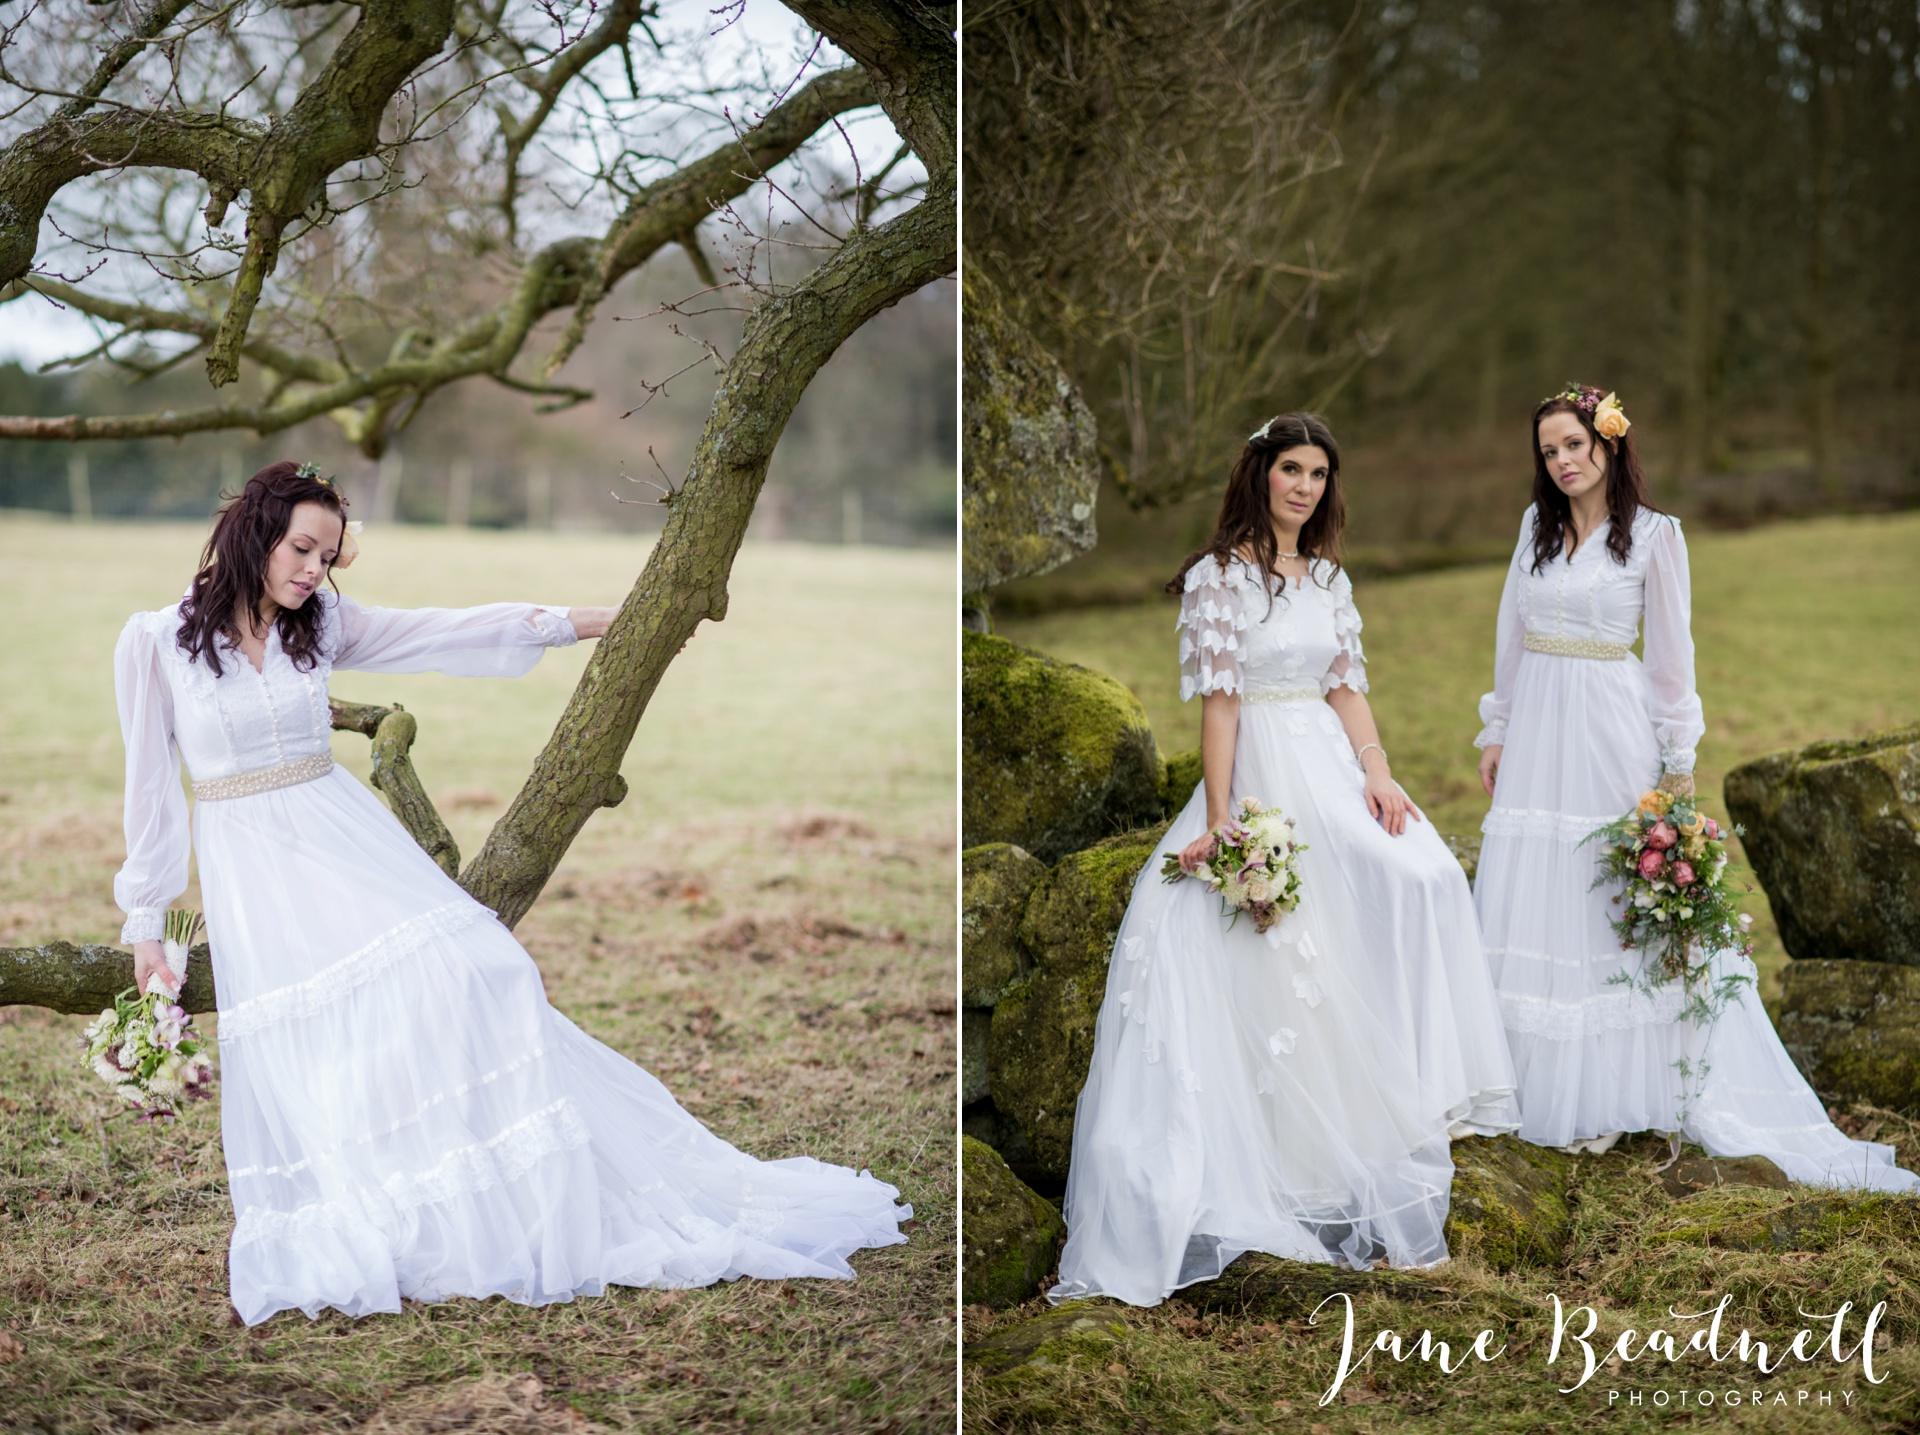 Jane Beadnell fine art wedding photographer Swinton Park8